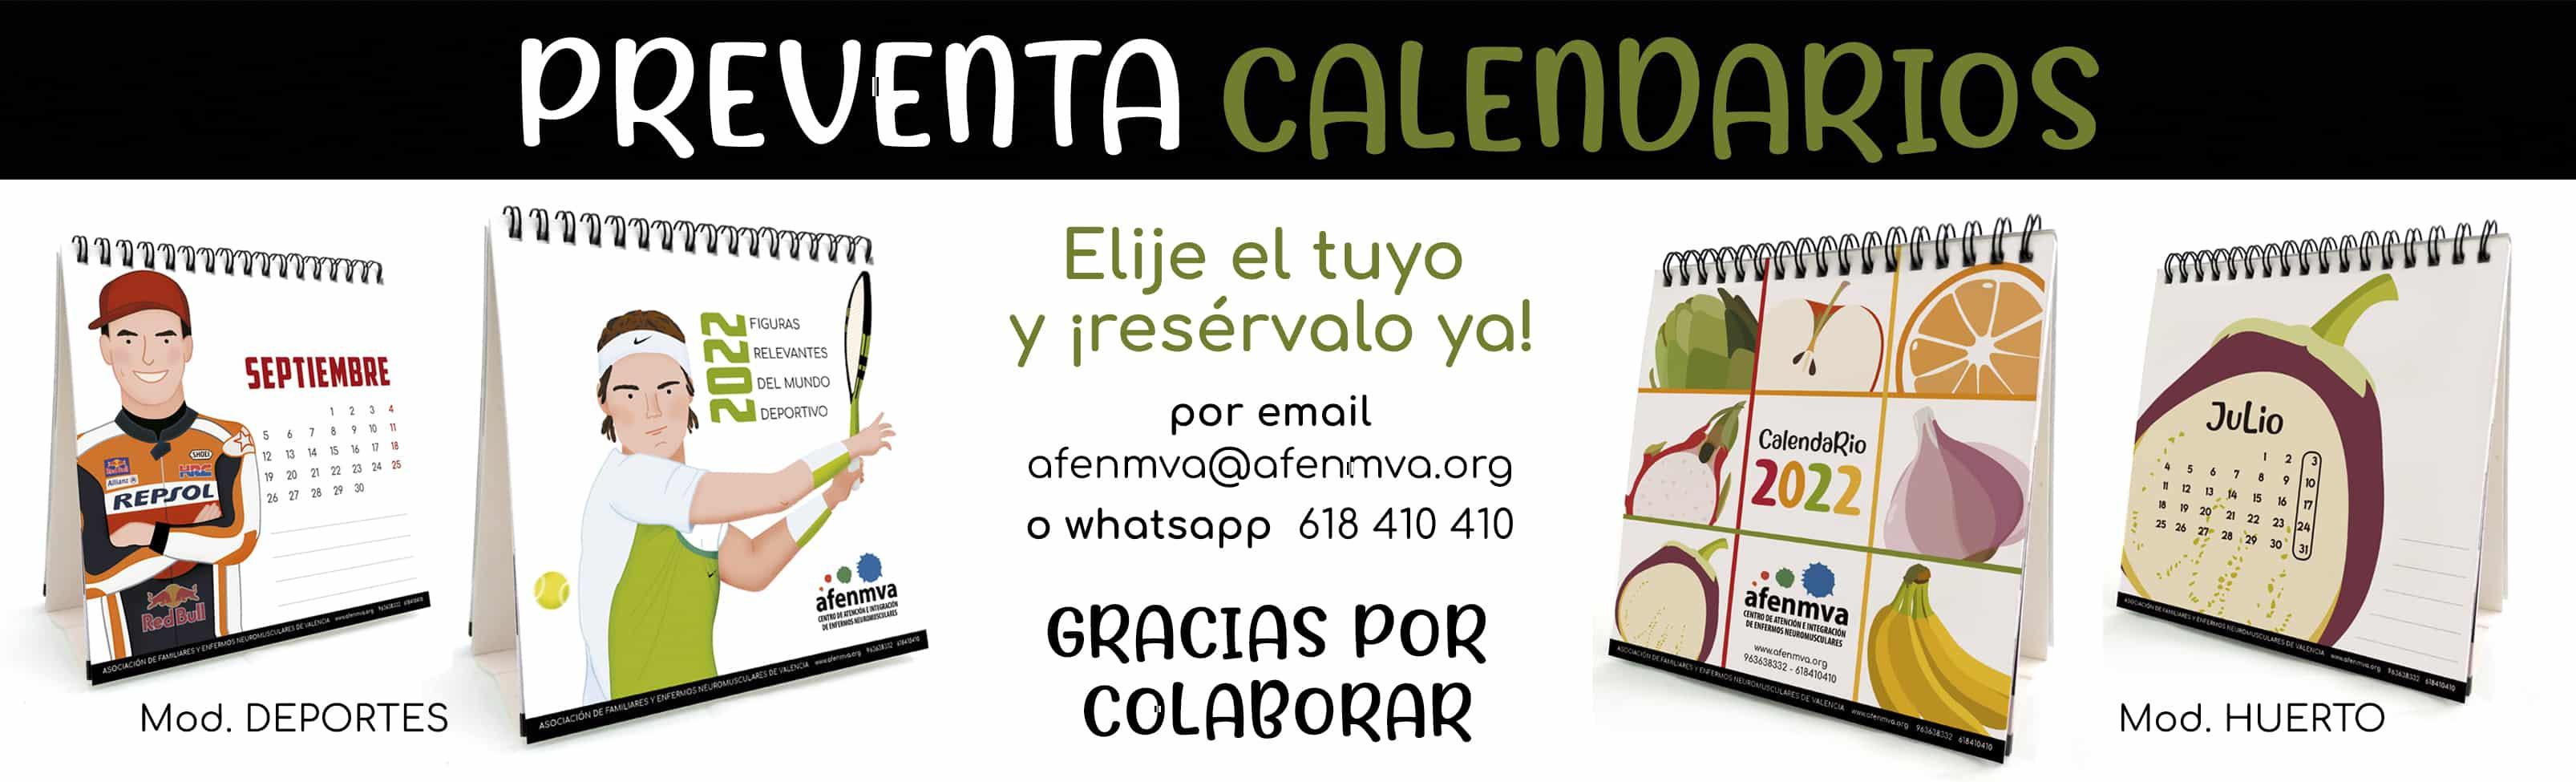 Cabecera-Calendario 2022